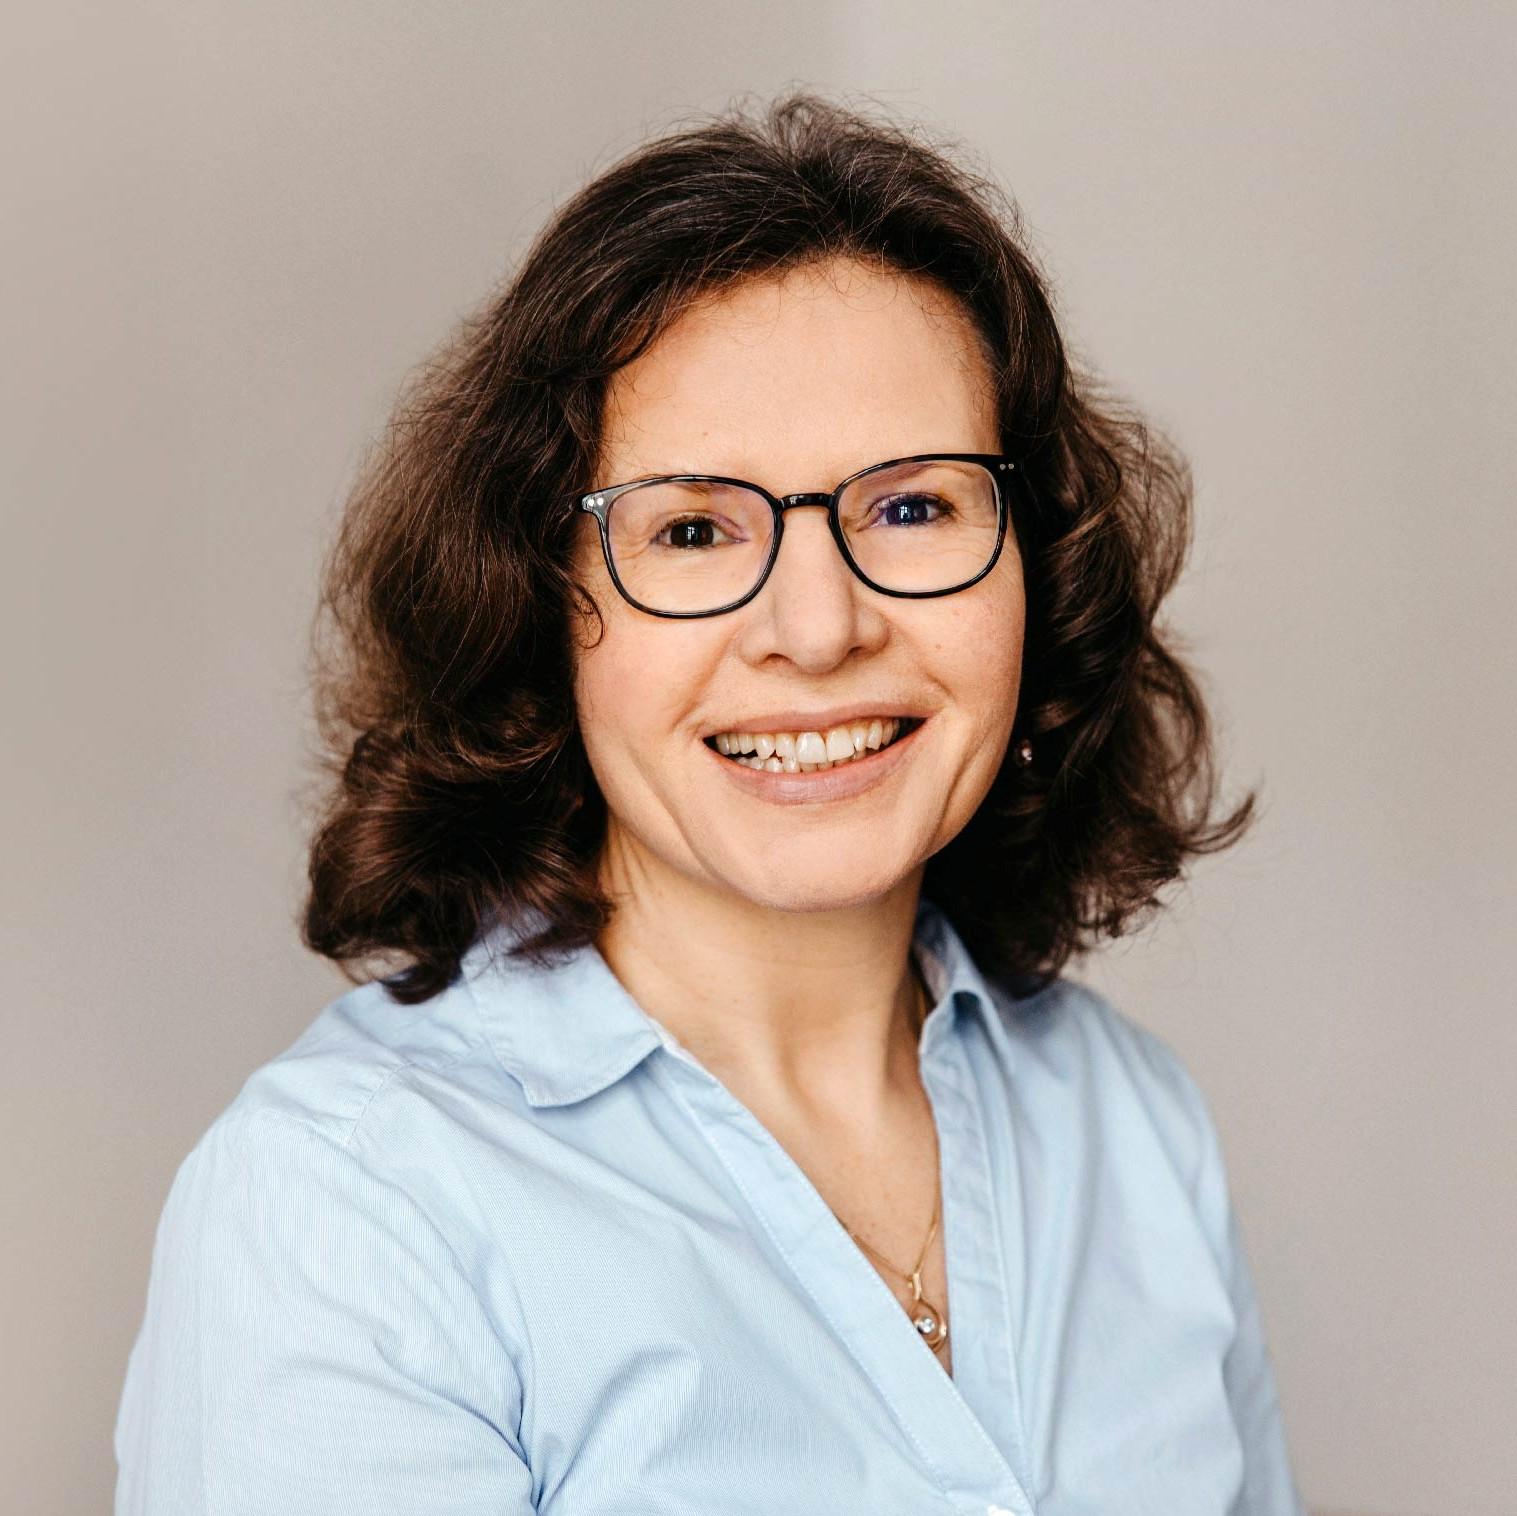 Birgitta Setz